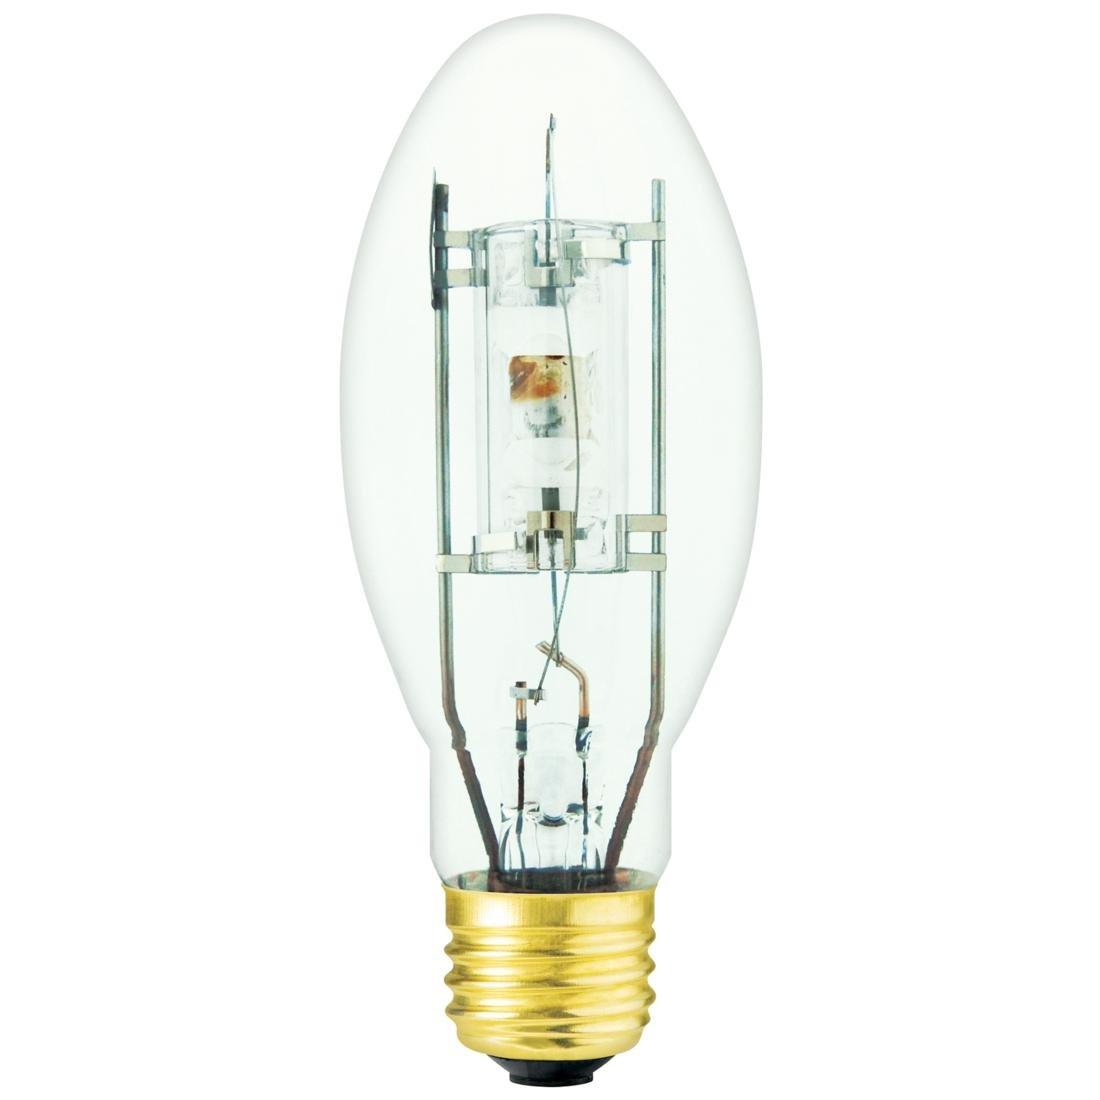 Sylvania MP100/U/MED 100W Metalarc Pro-Tech Pulse Start Quartz Metal Halide Lamp (64417)